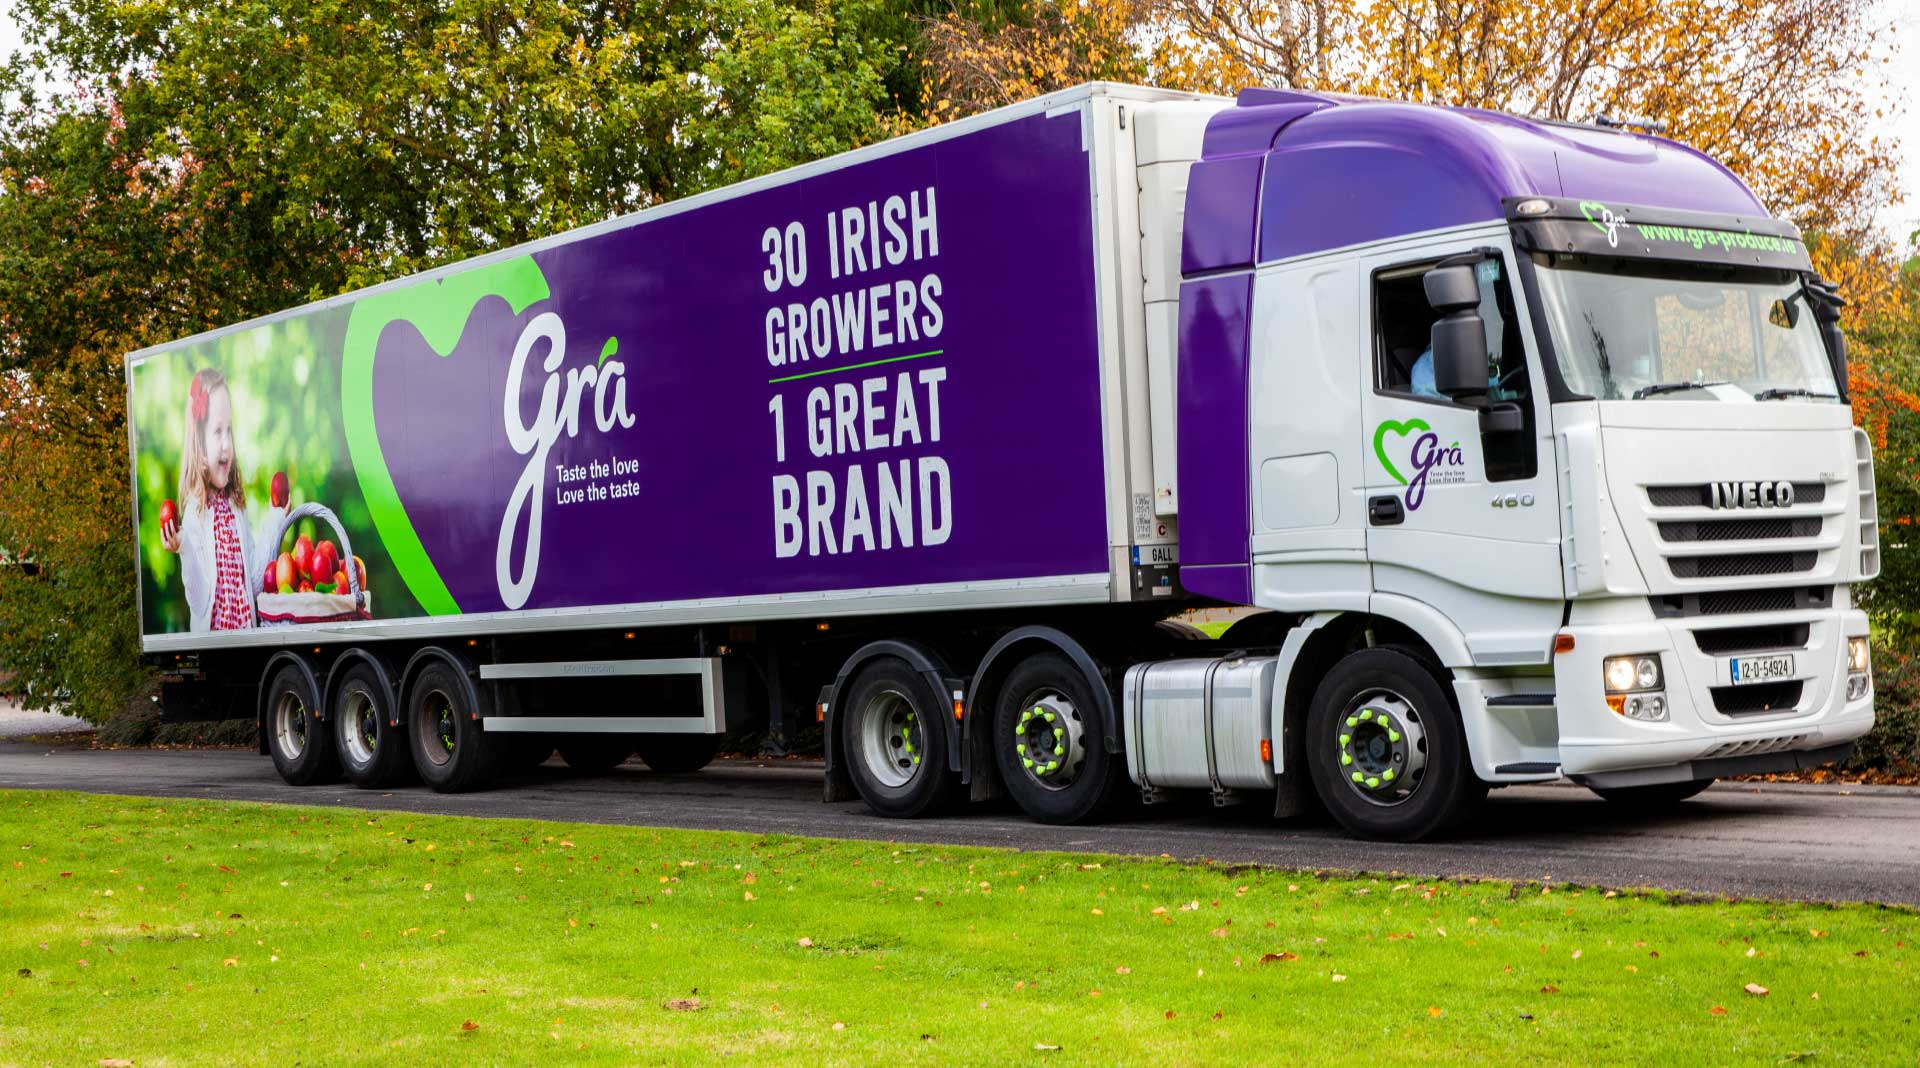 Grá truck and livery design.